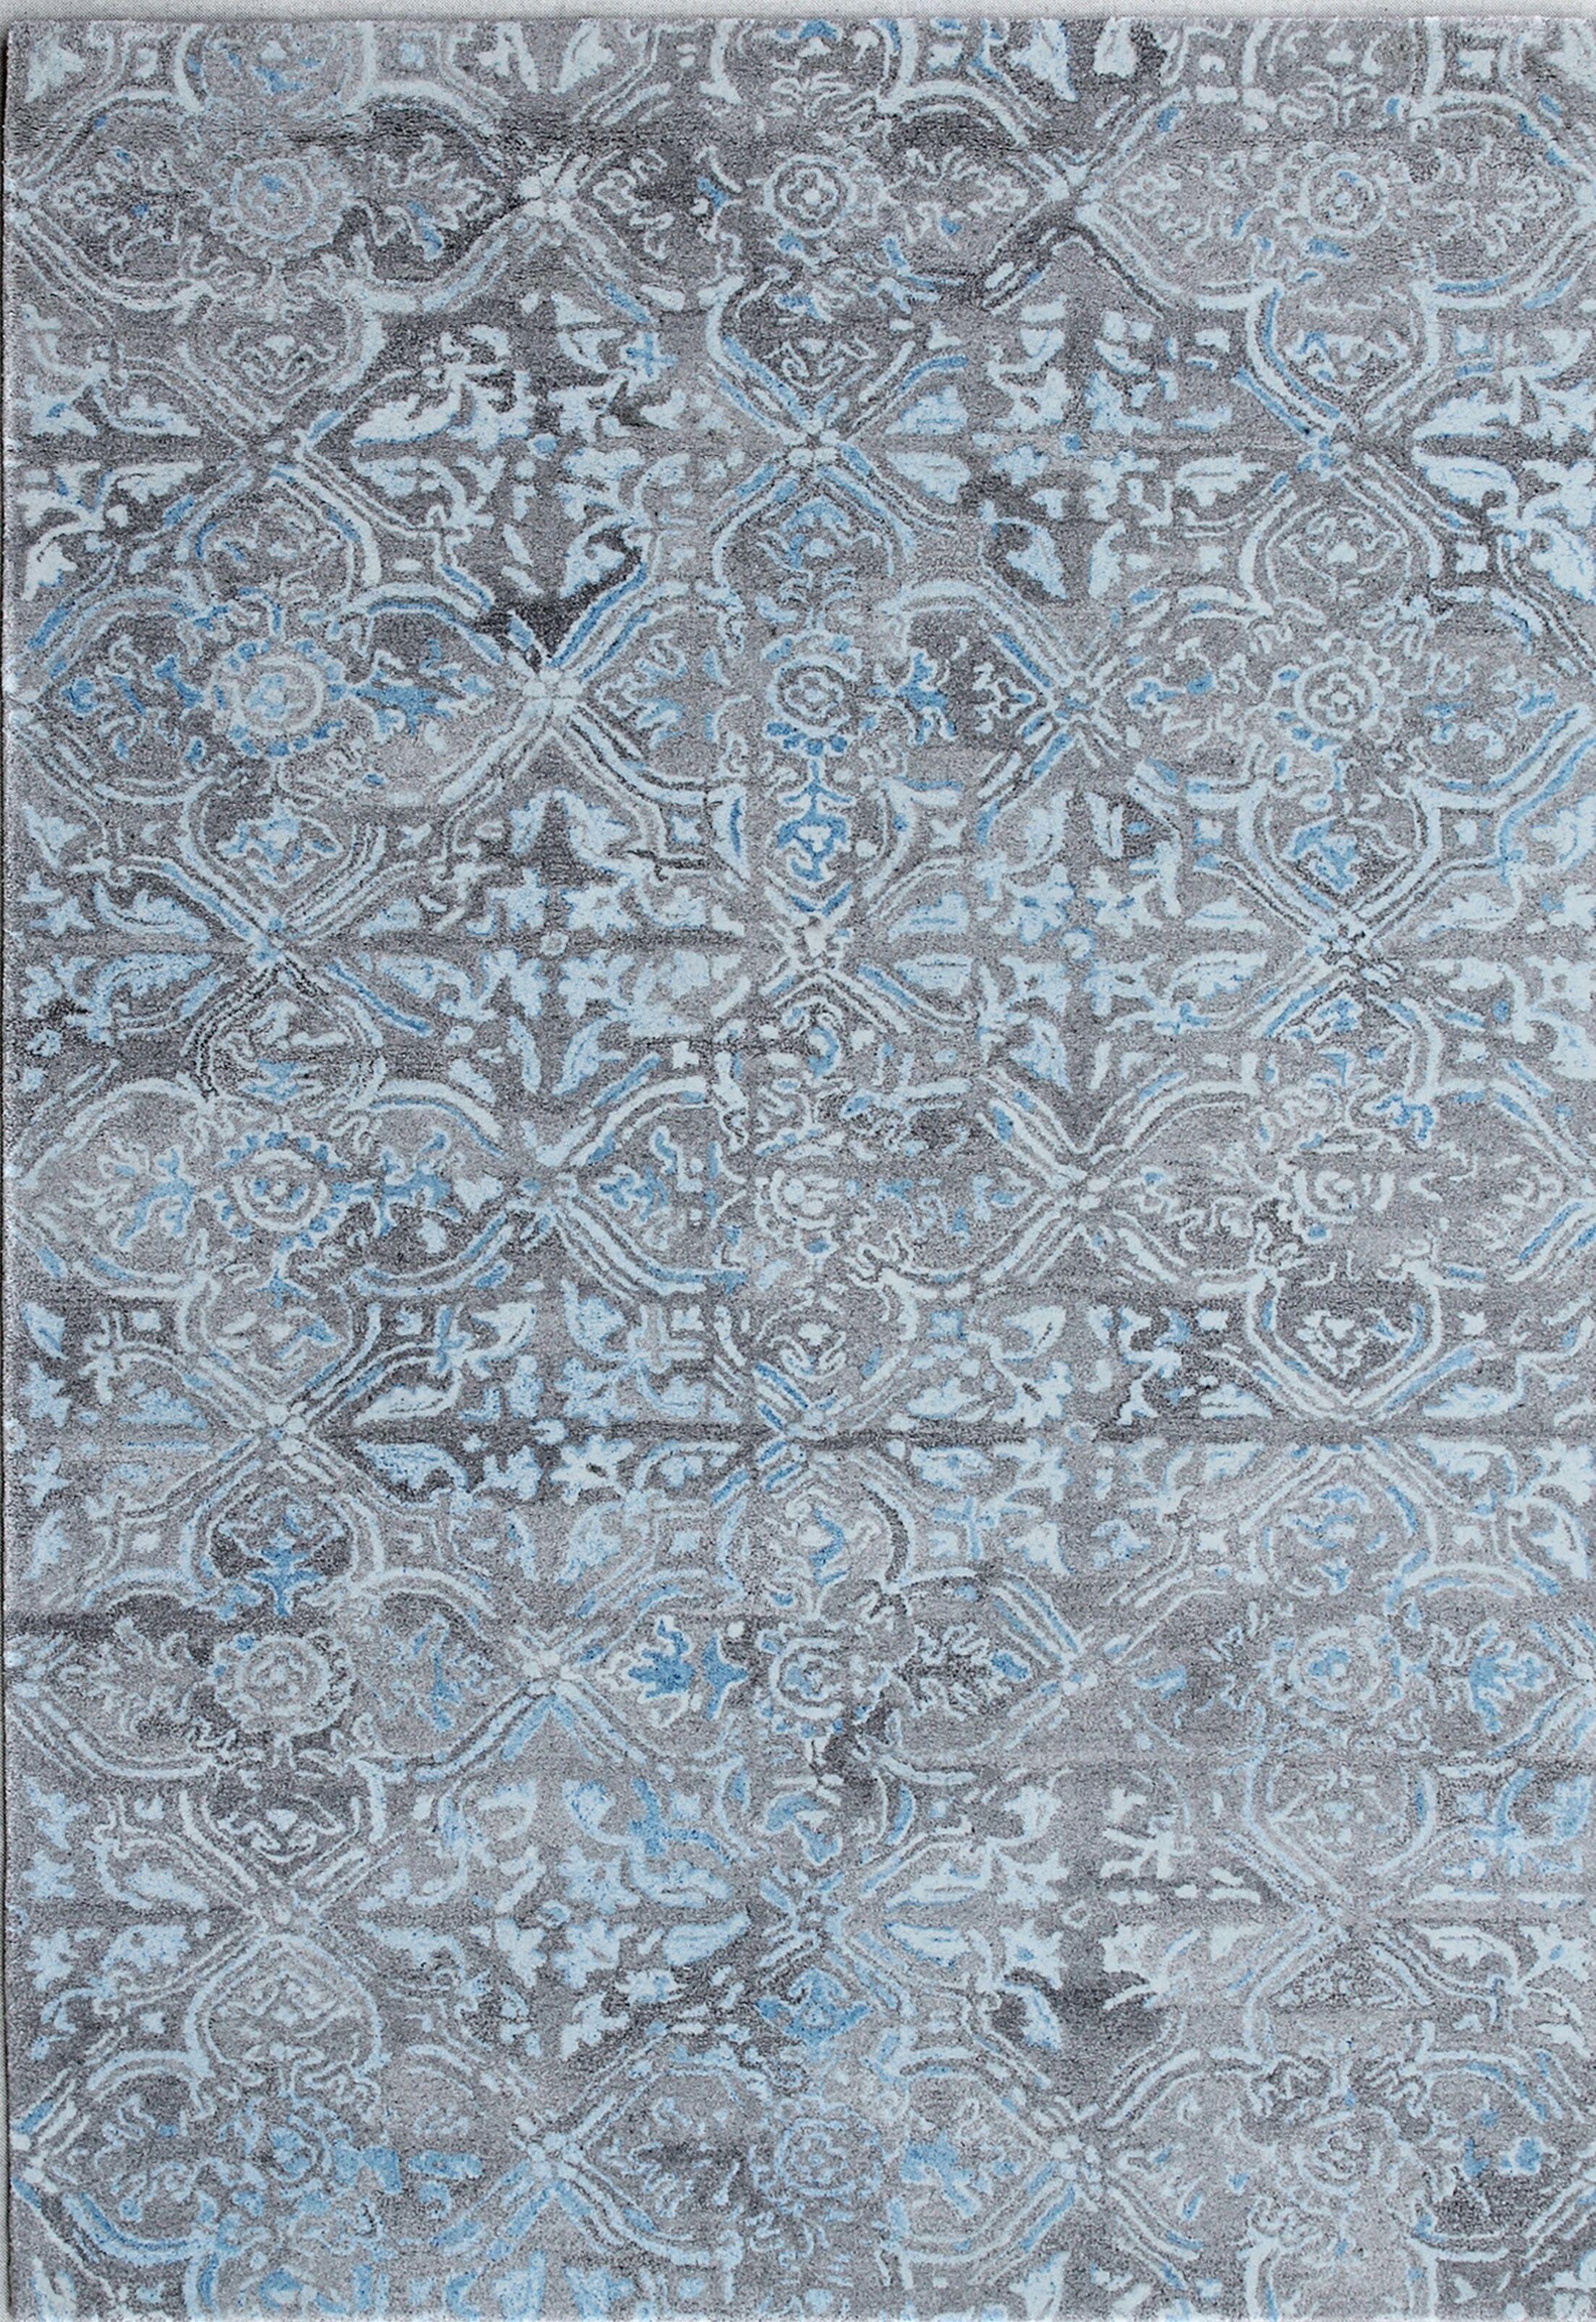 Correa Hand-Woven Gray/Blue Area Rug Rug Size: Rectangle 5' x 8'